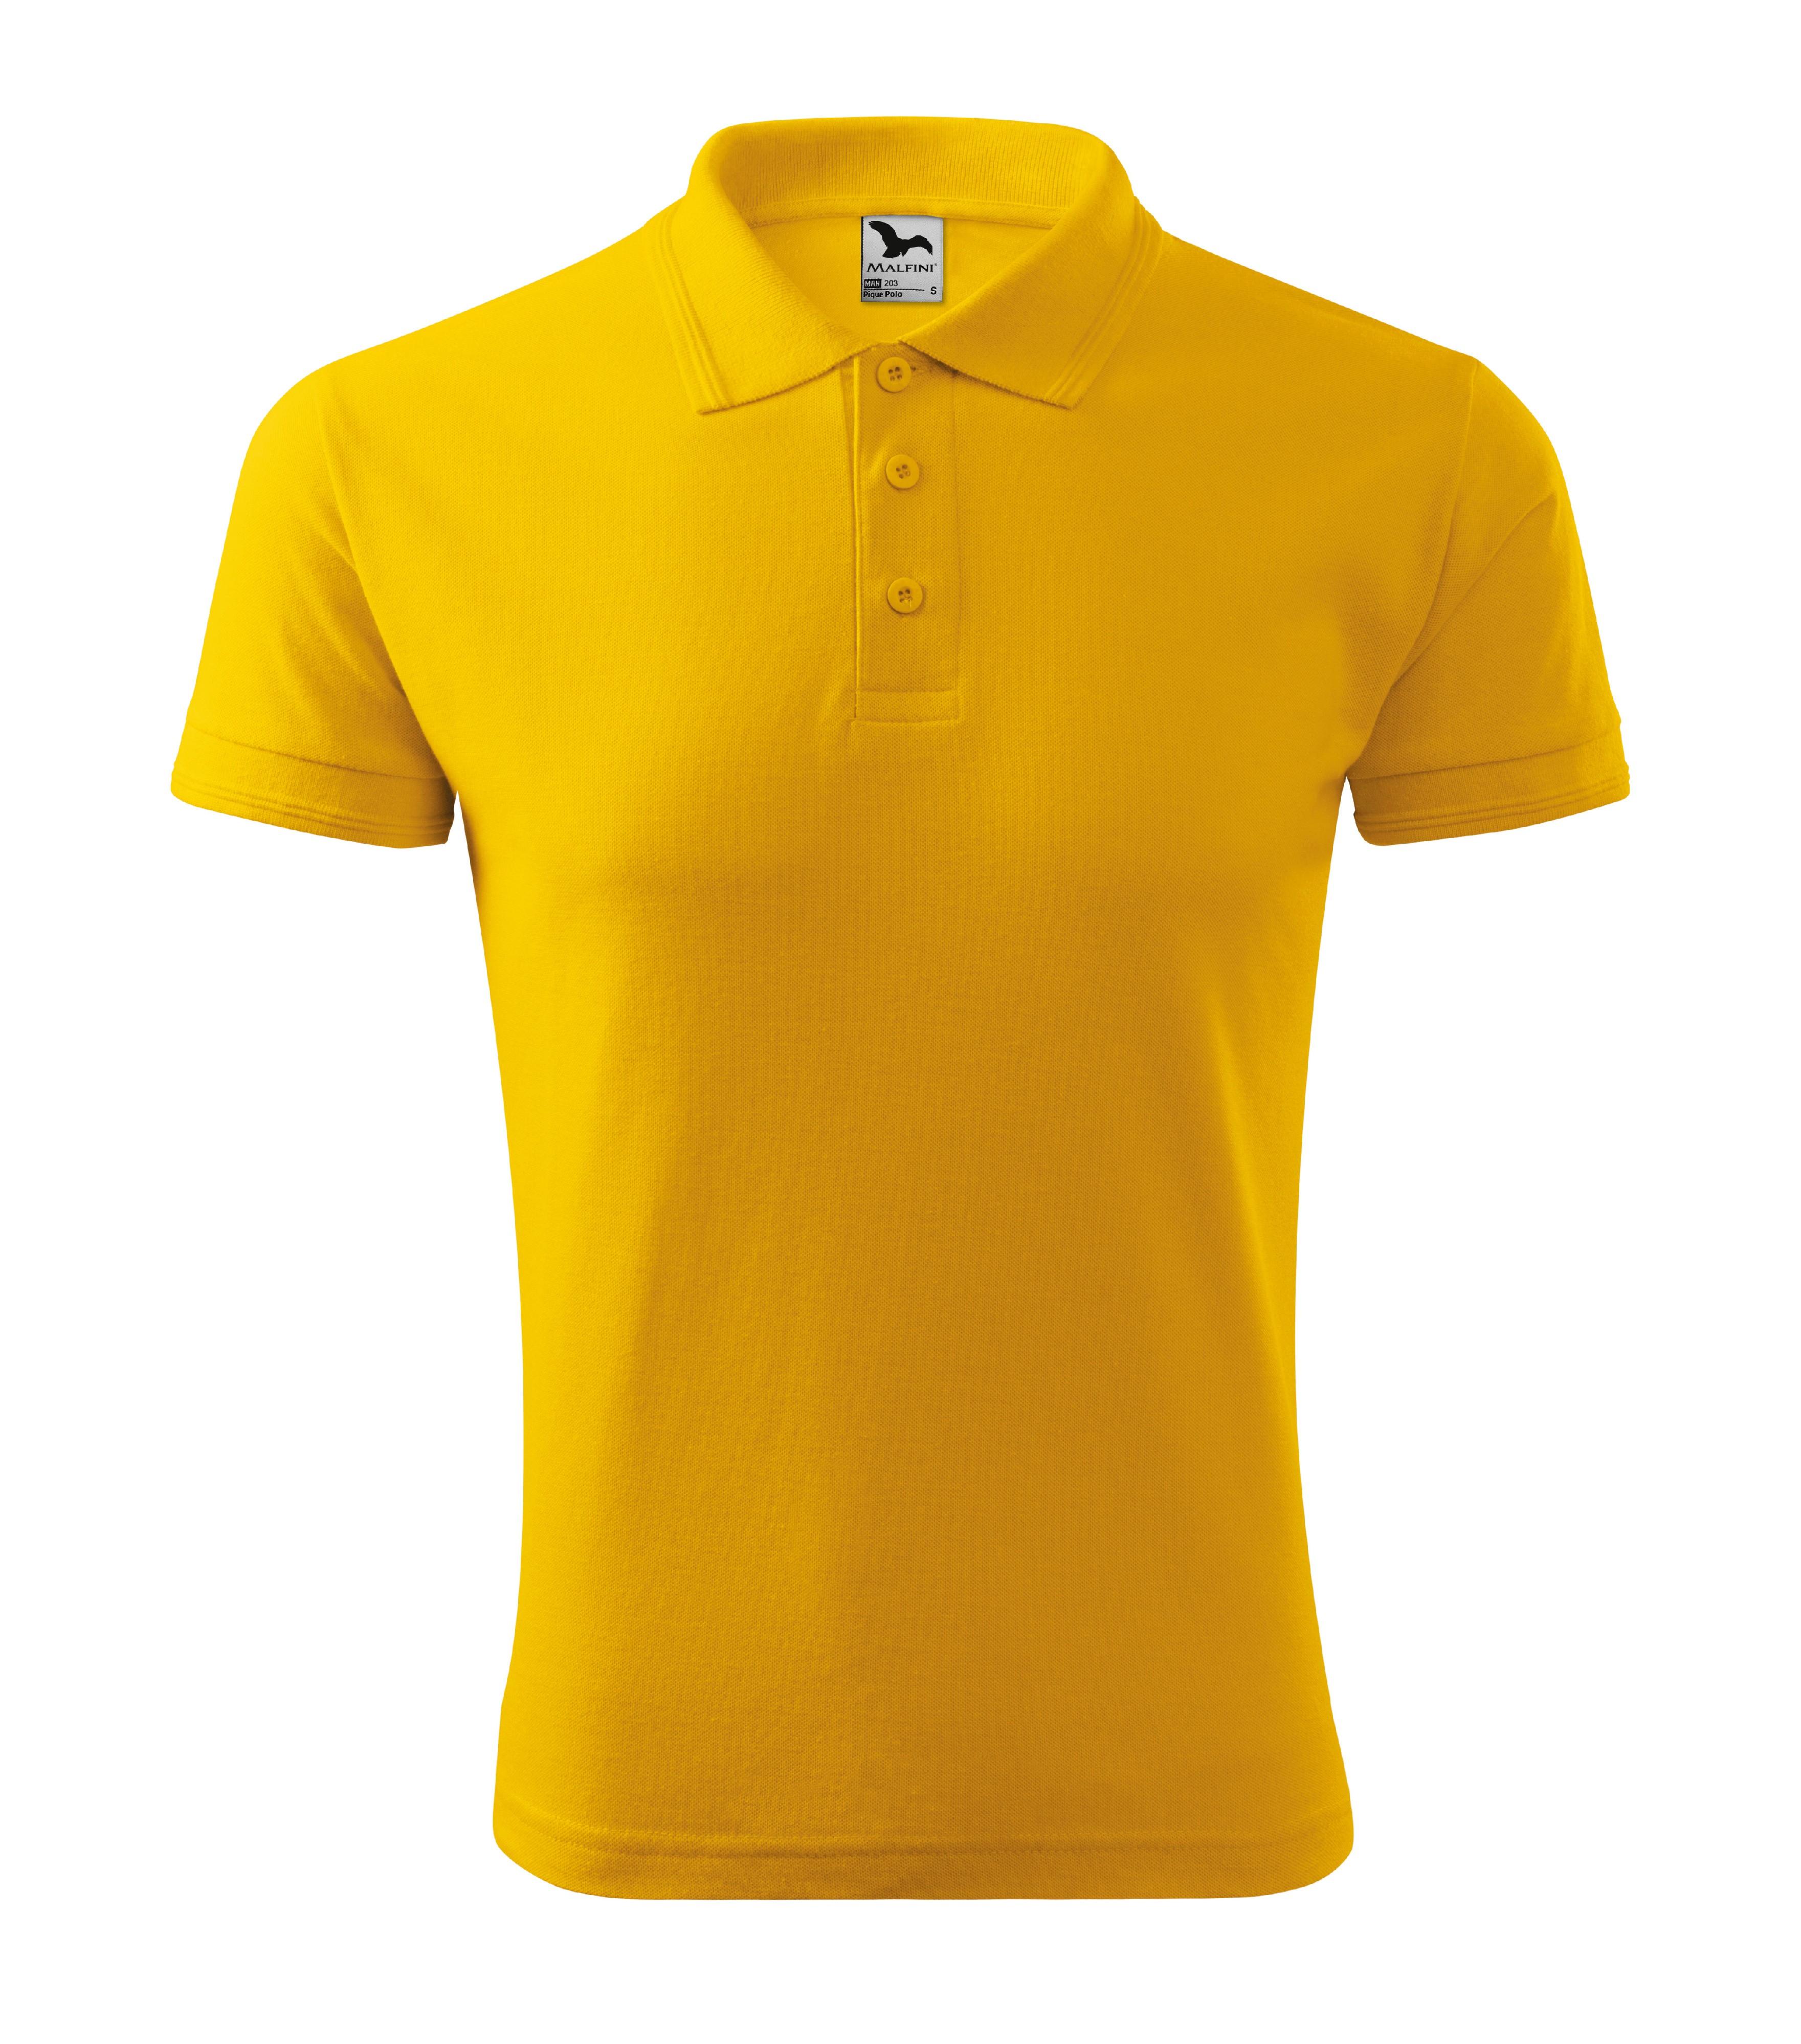 Polokošile pánská Pique Polo Barva: žlutá, Velikost: L